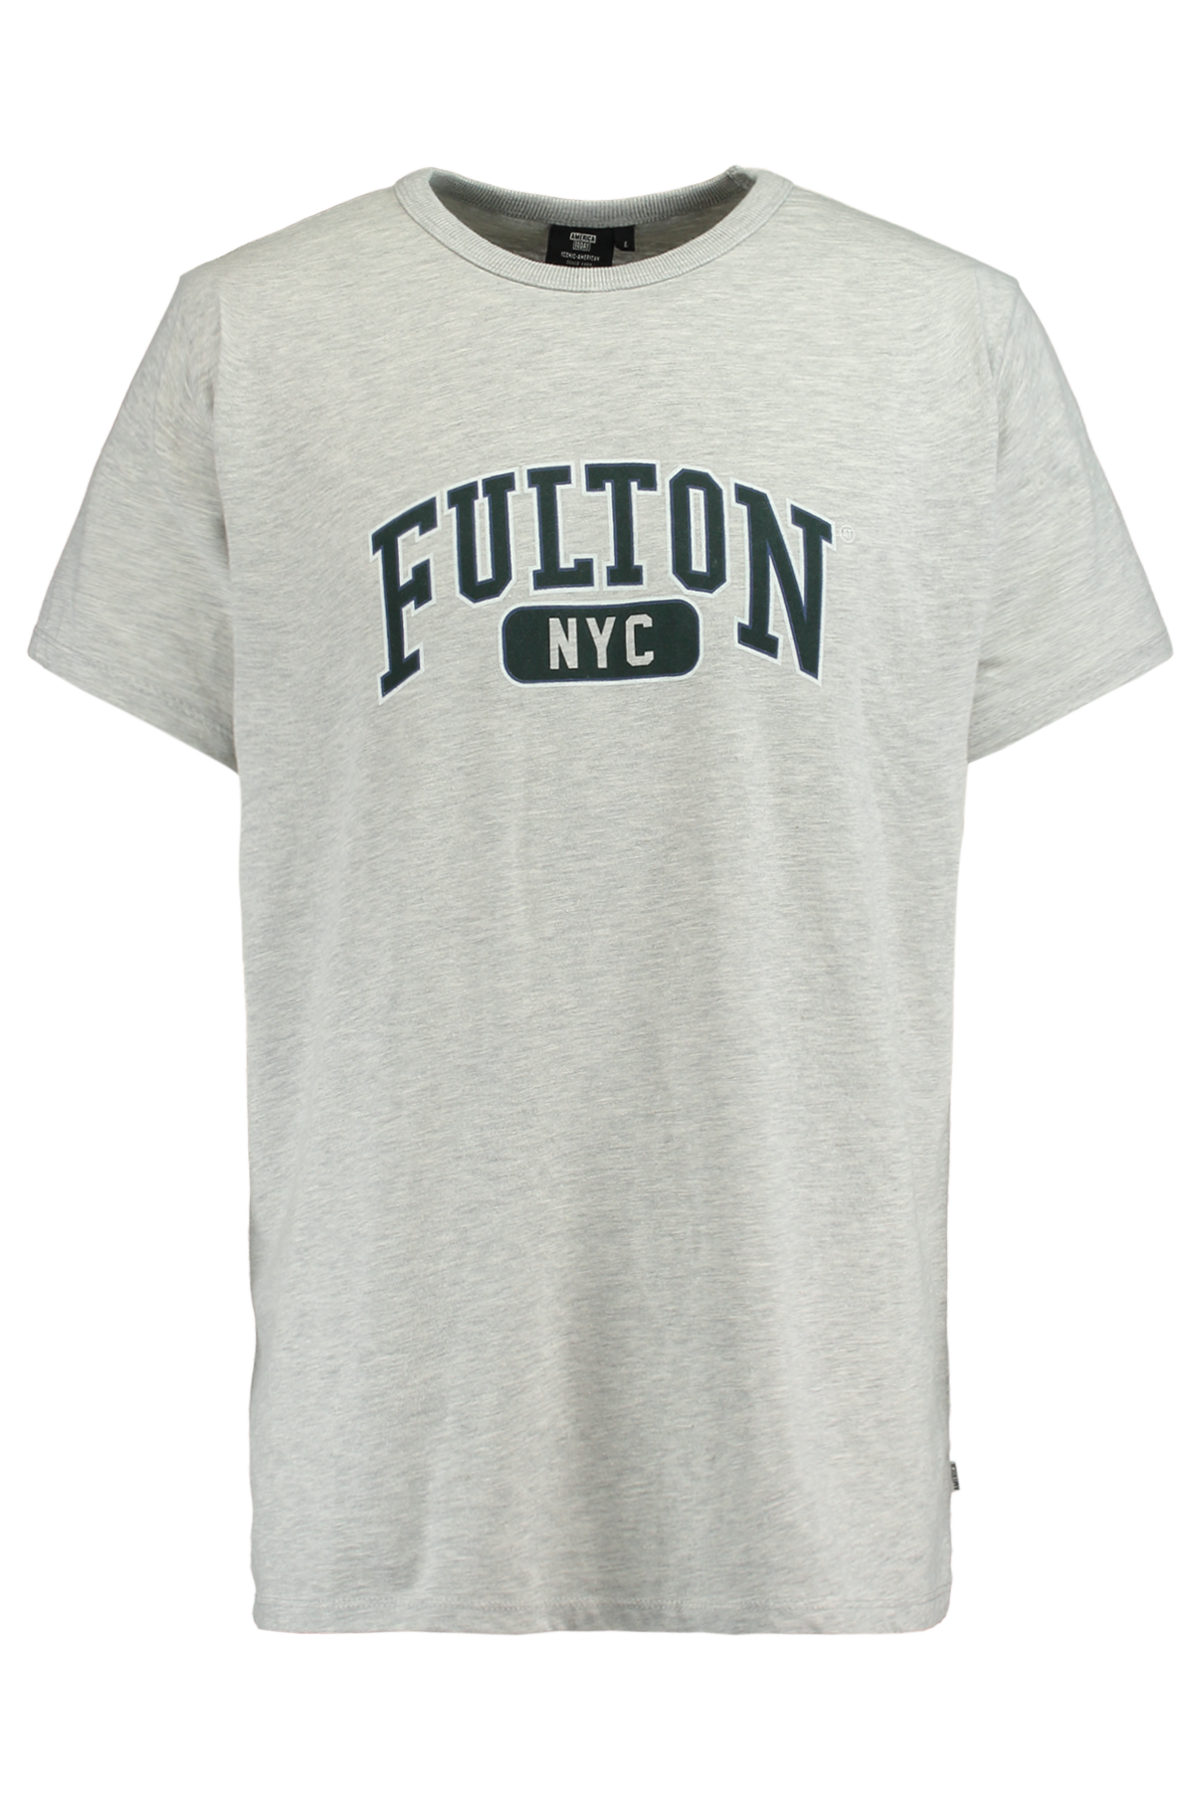 T-shirt Edward NYC